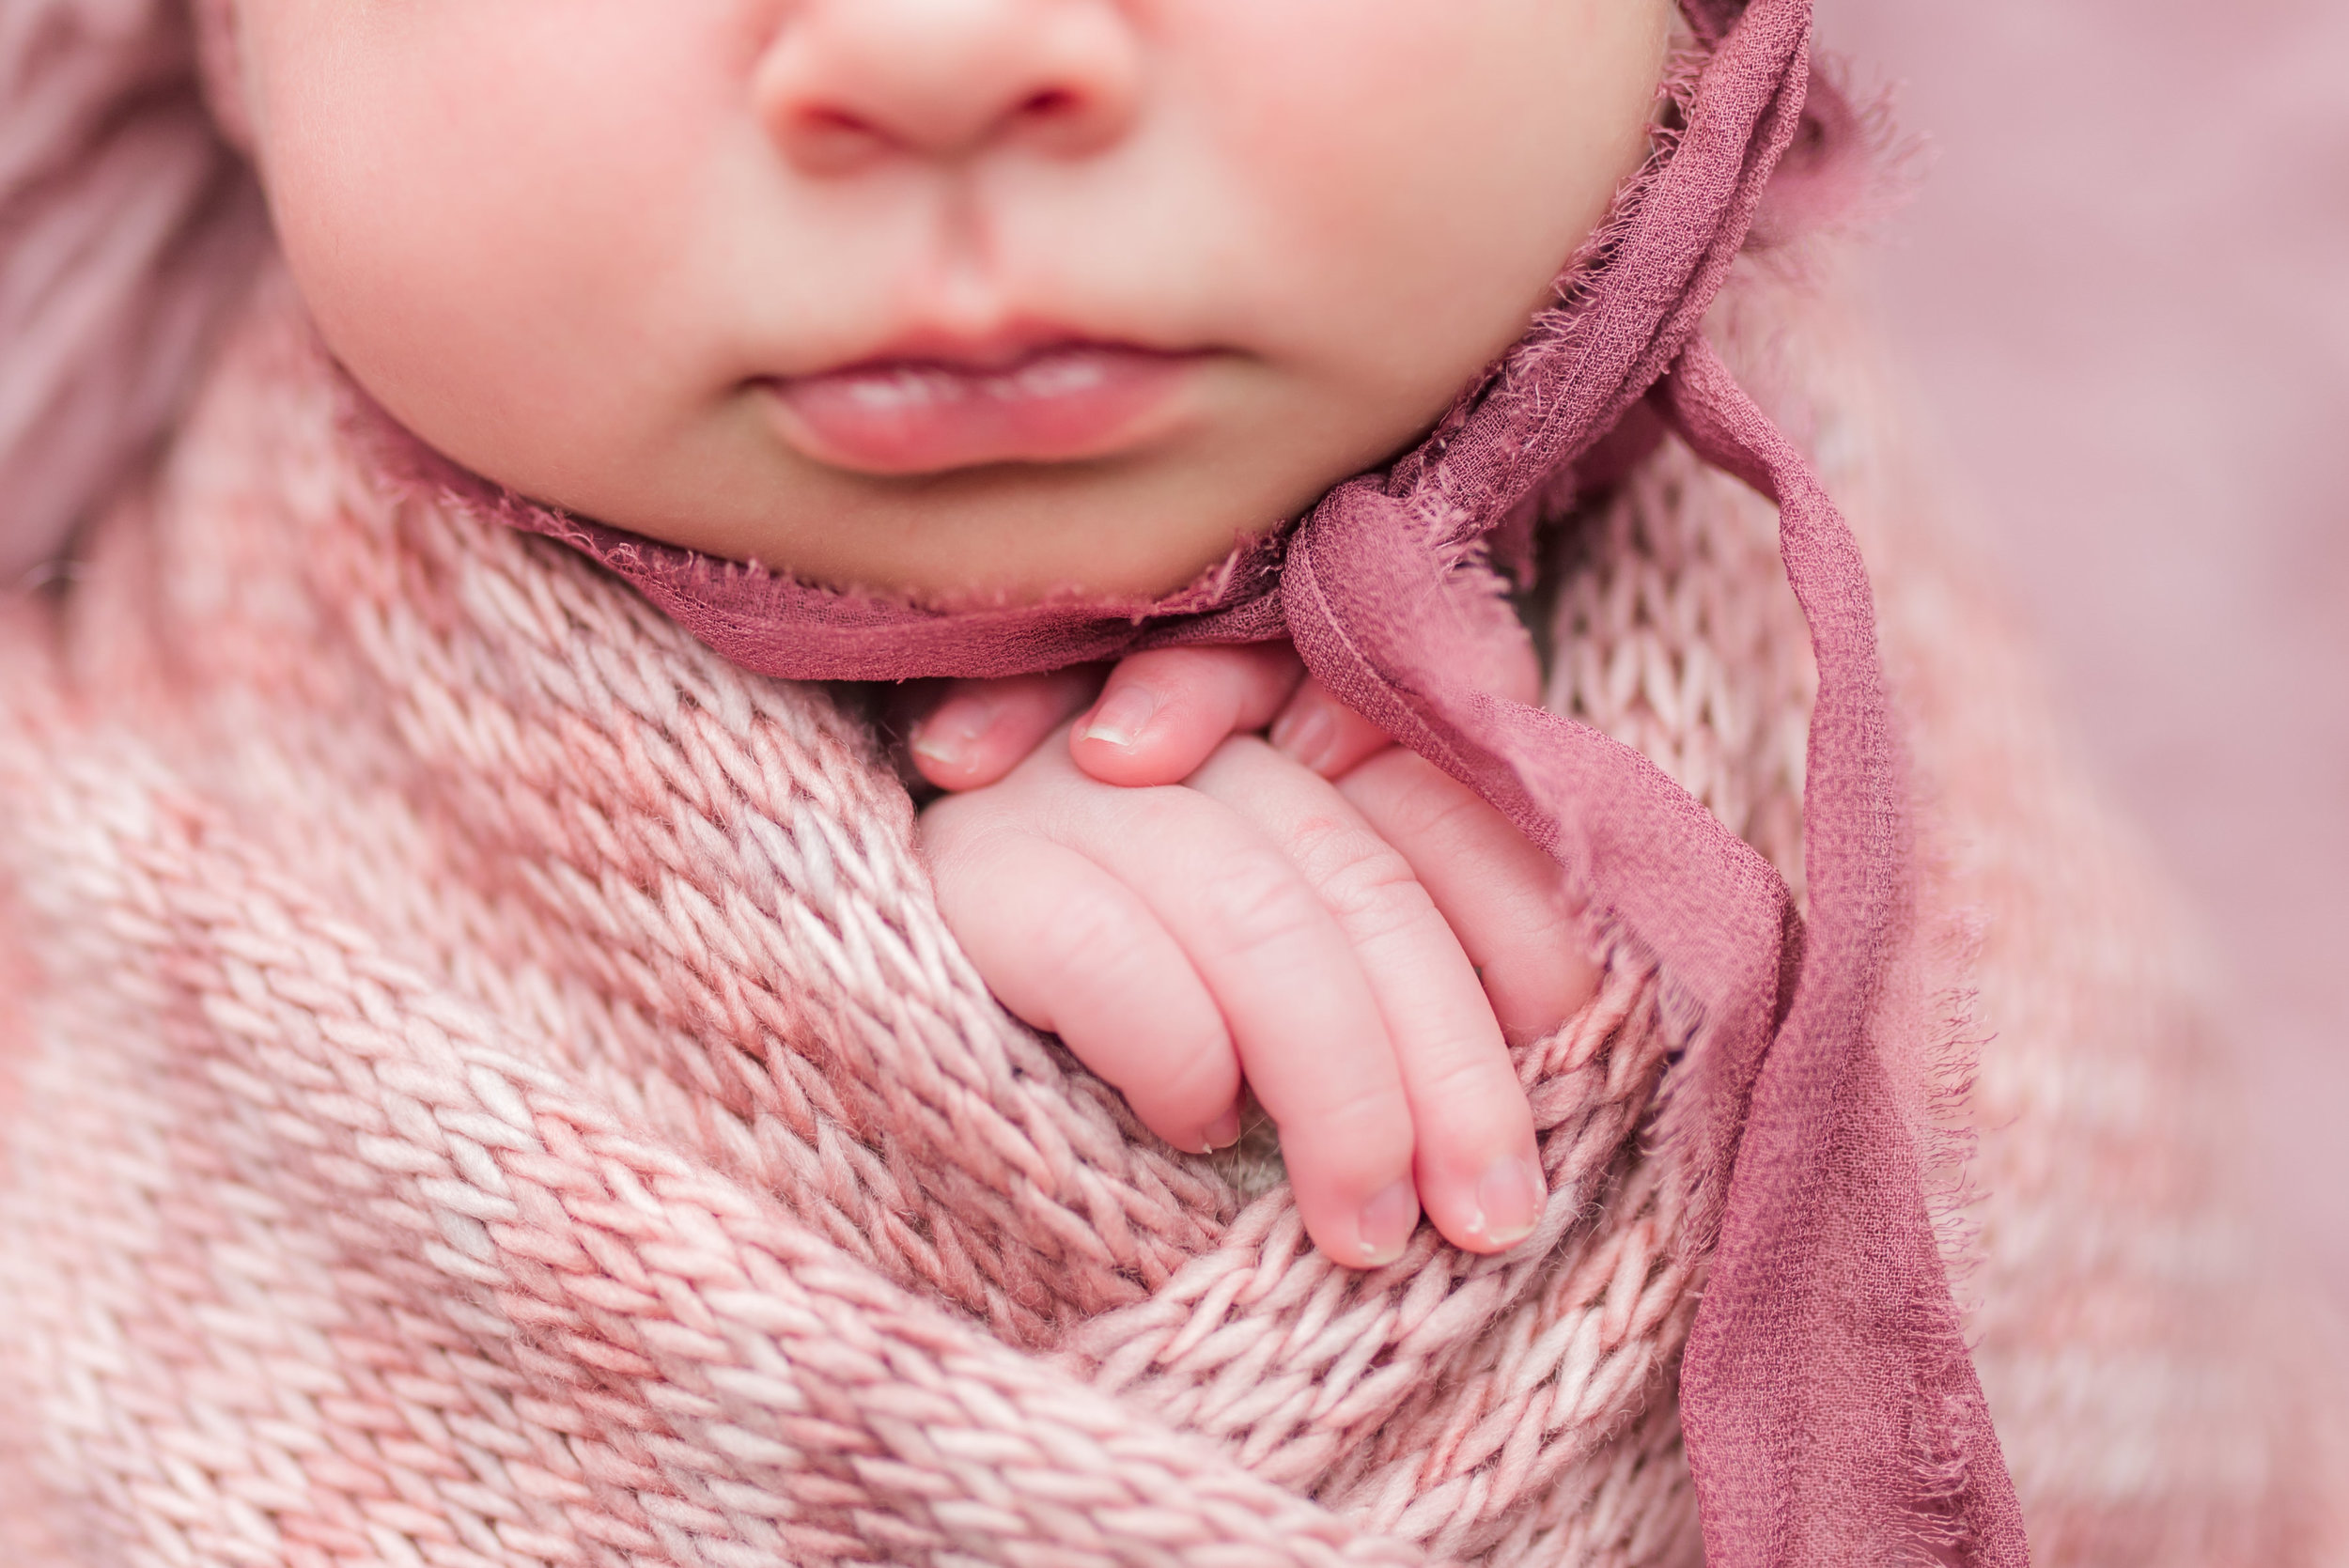 eastern-kentucky-family-photographer-newborn-2